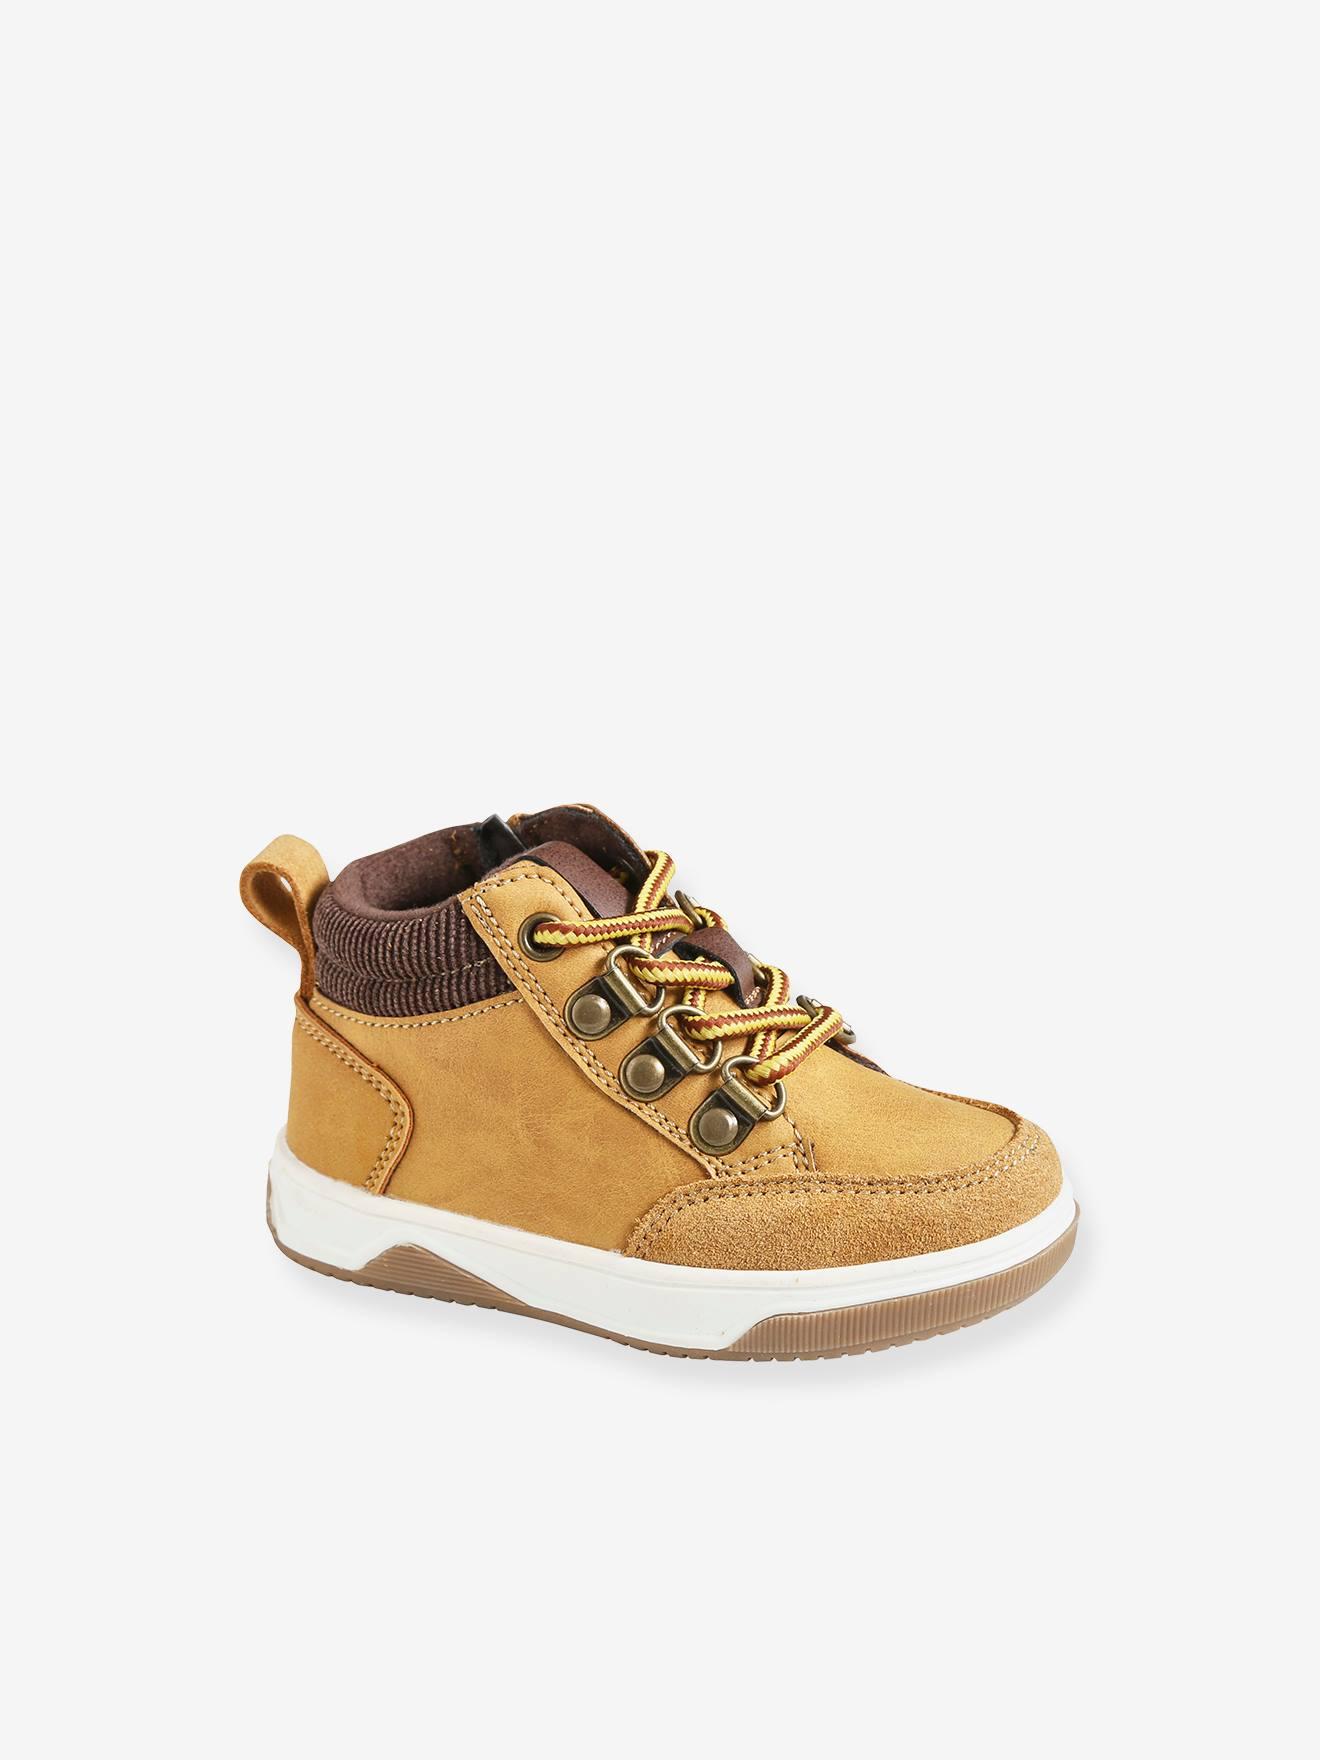 chaussures timberland garcon 26